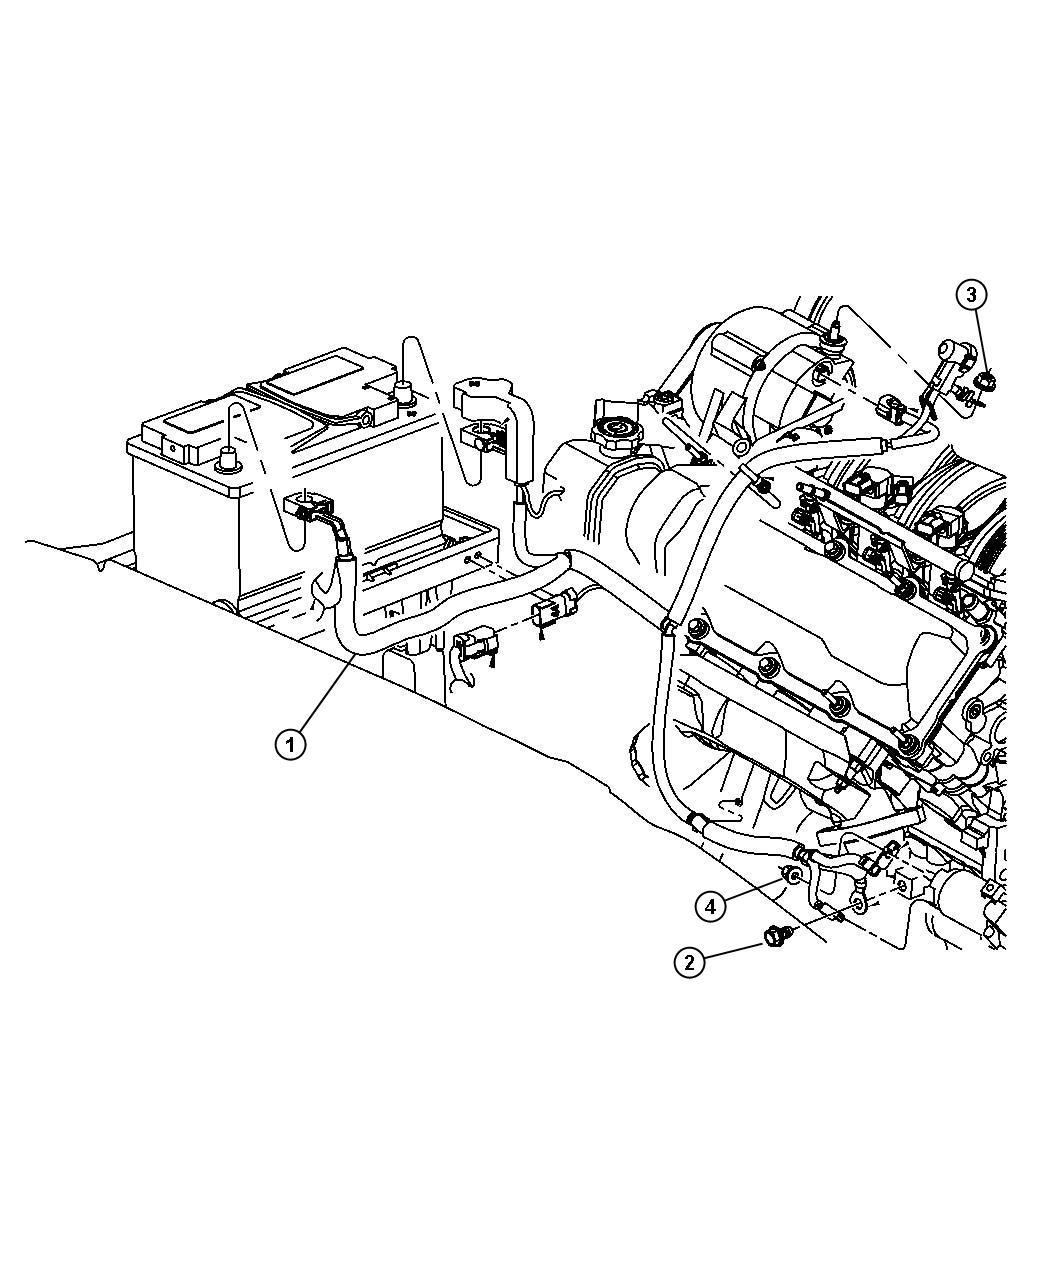 Jeep Cj5 Alternator Wiring